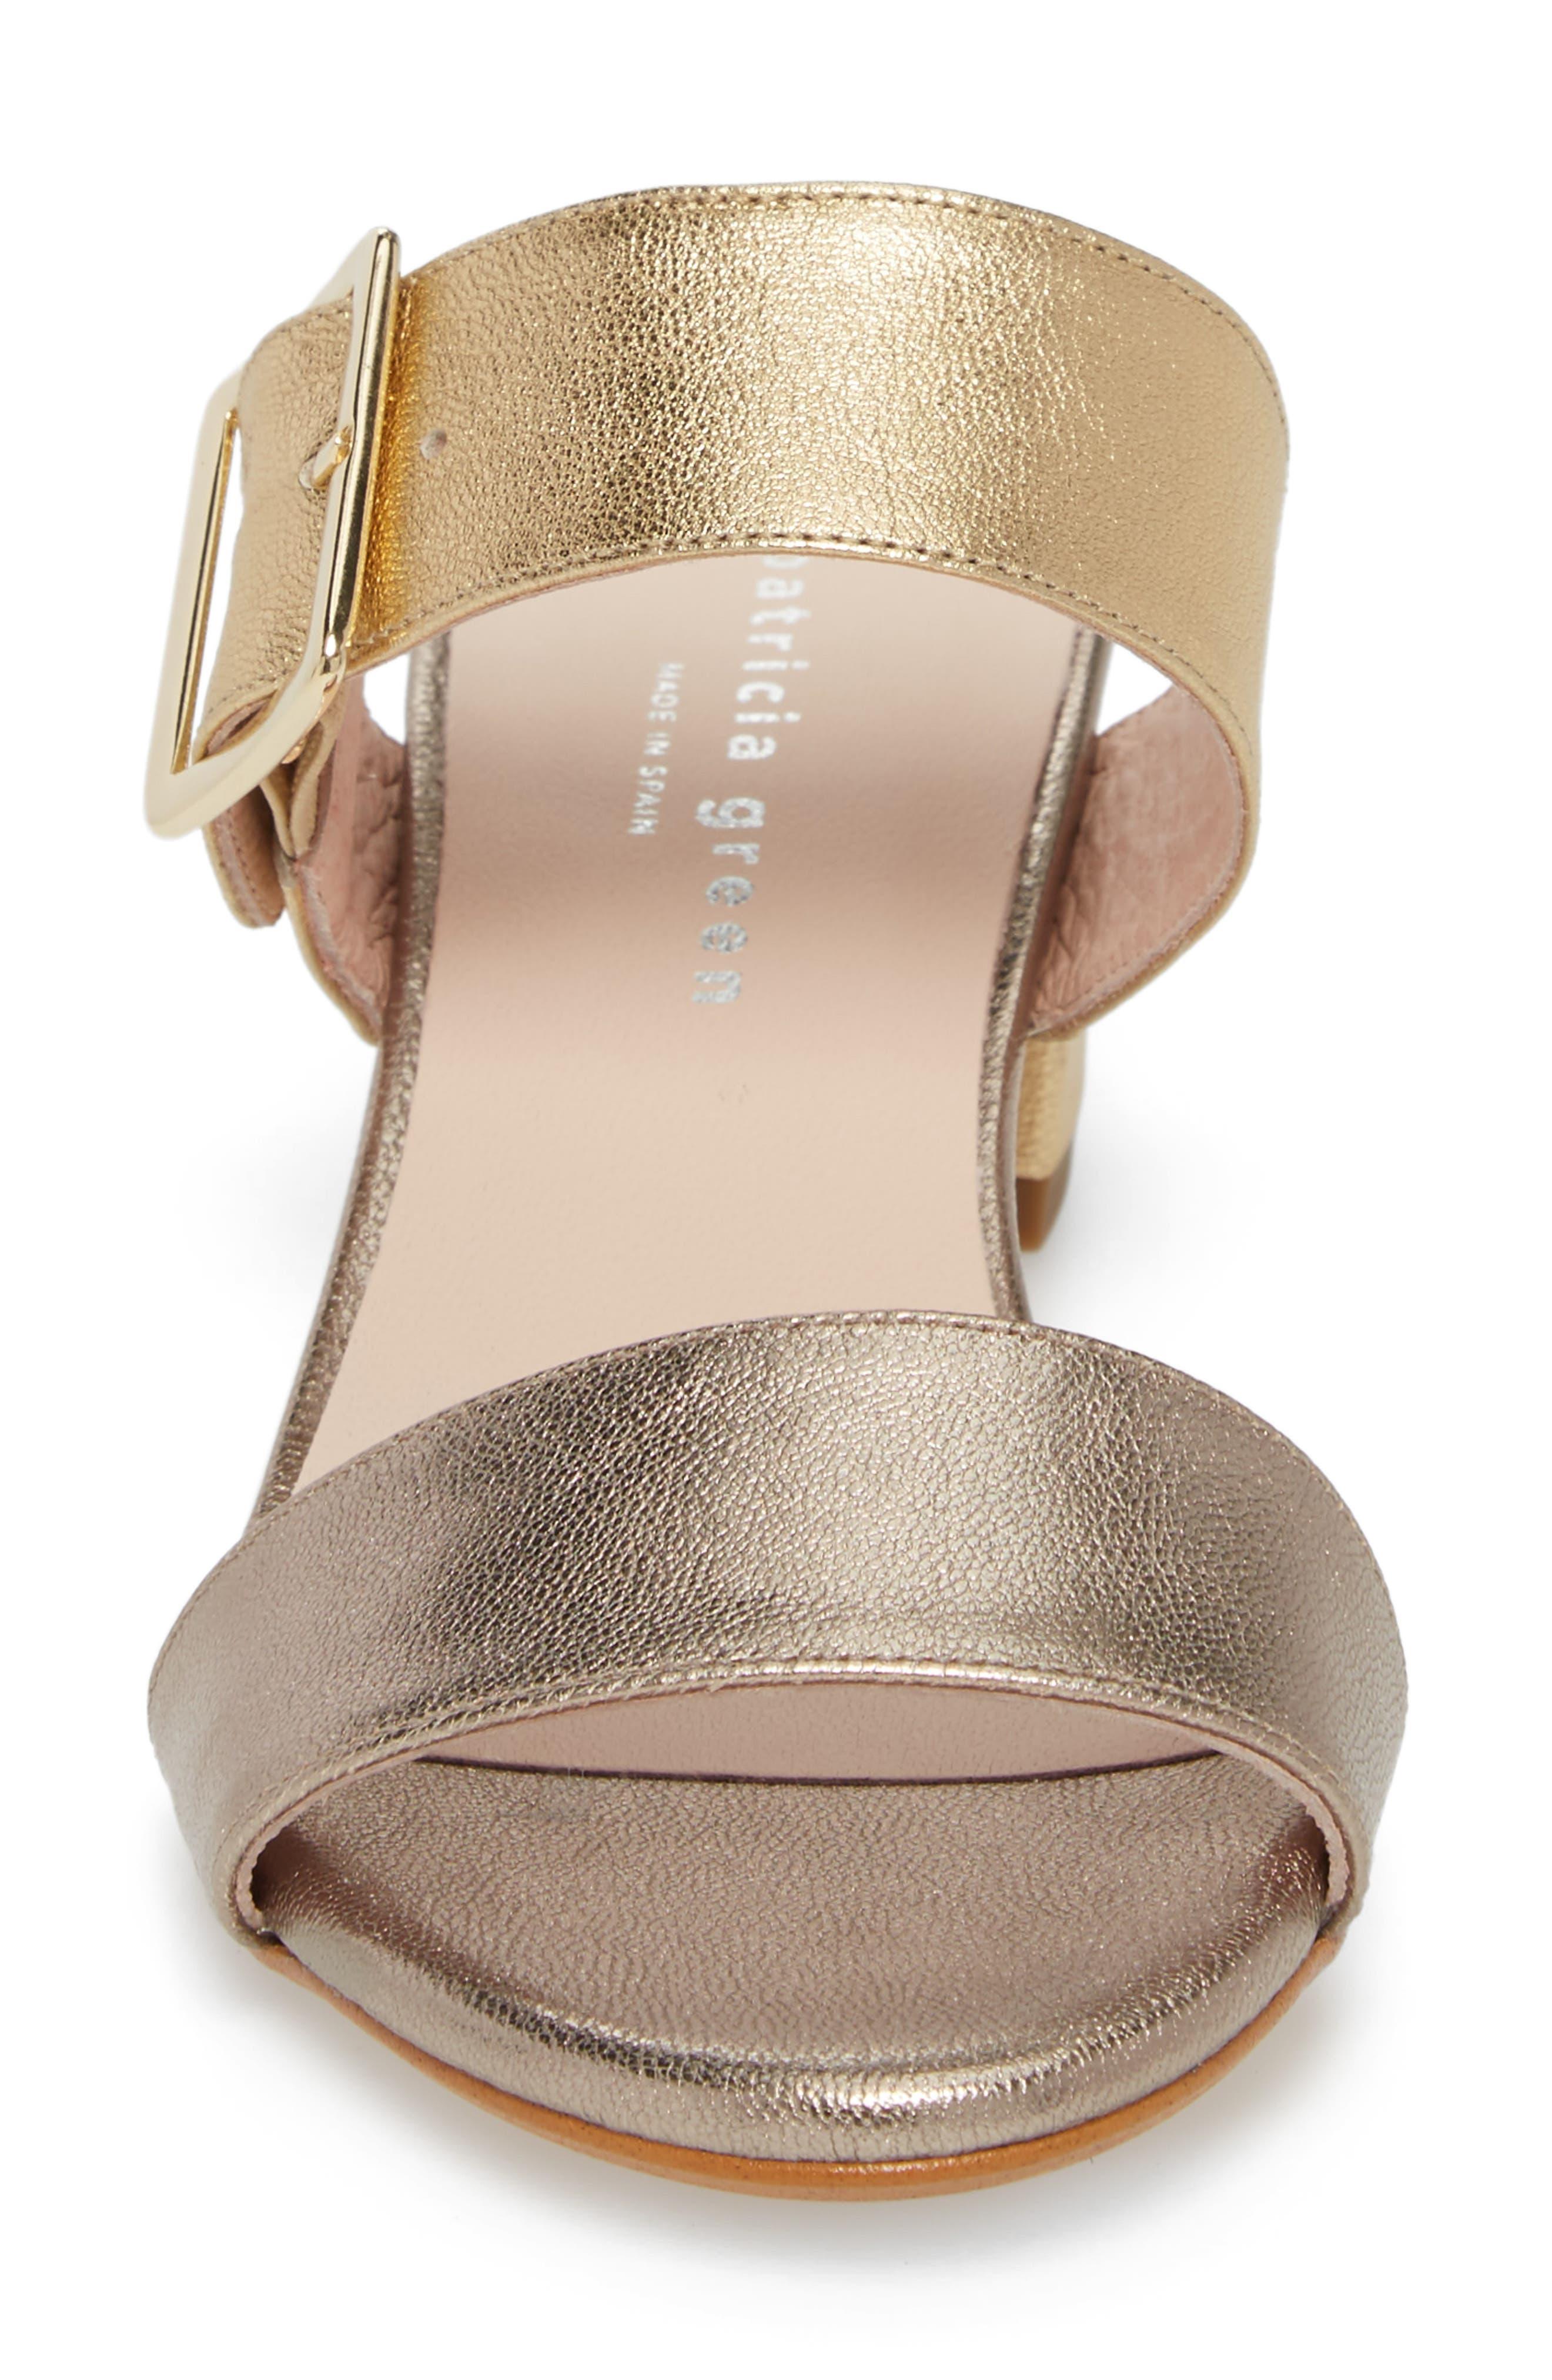 Ruth Slide Sandal,                             Alternate thumbnail 4, color,                             Gold/ Bronze Leather